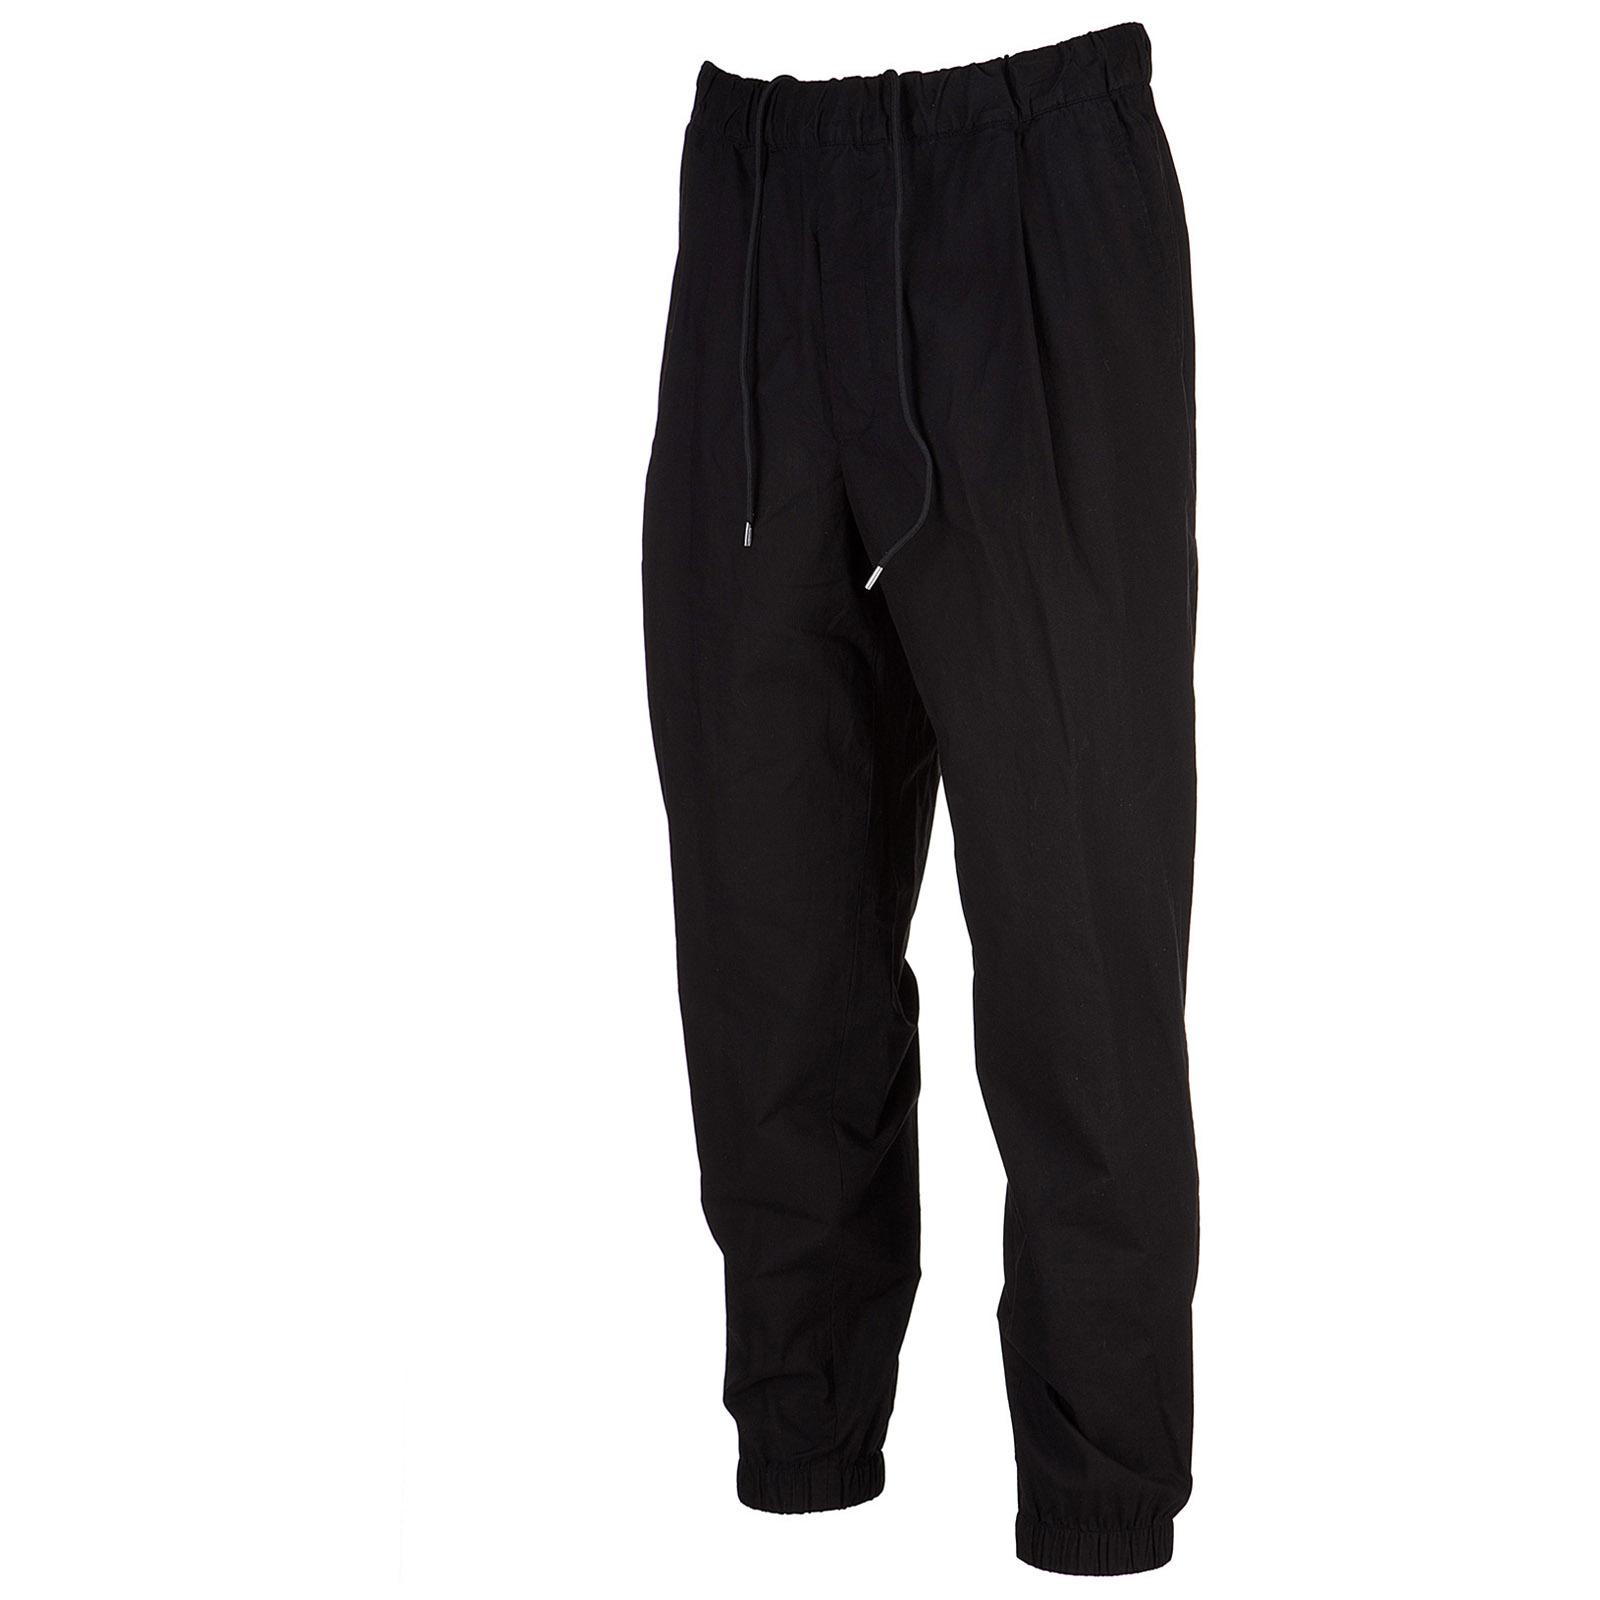 Pantalones de hombre chino trackpant